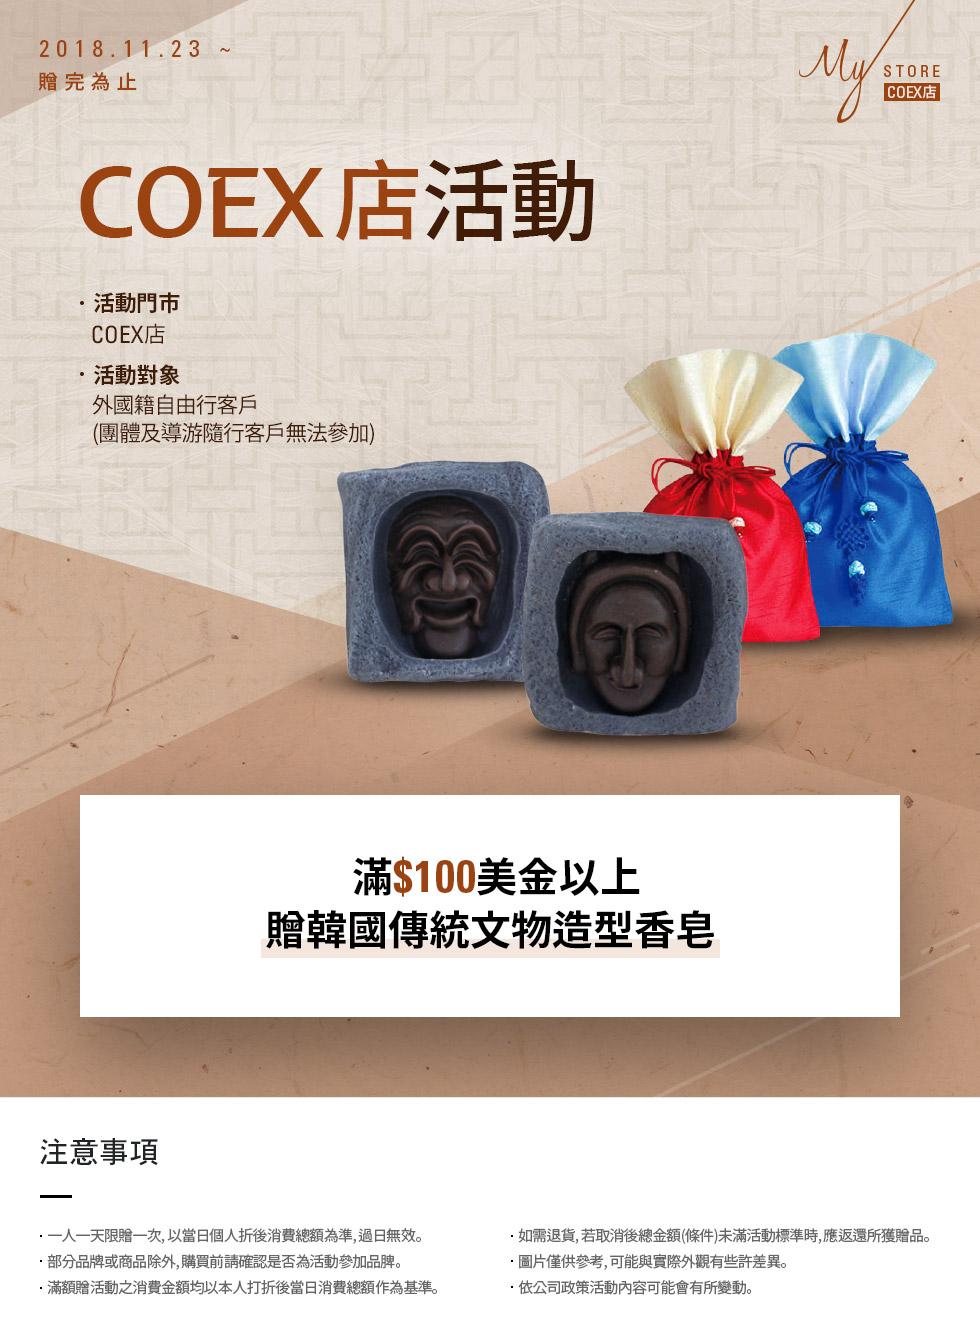 COEX店活動